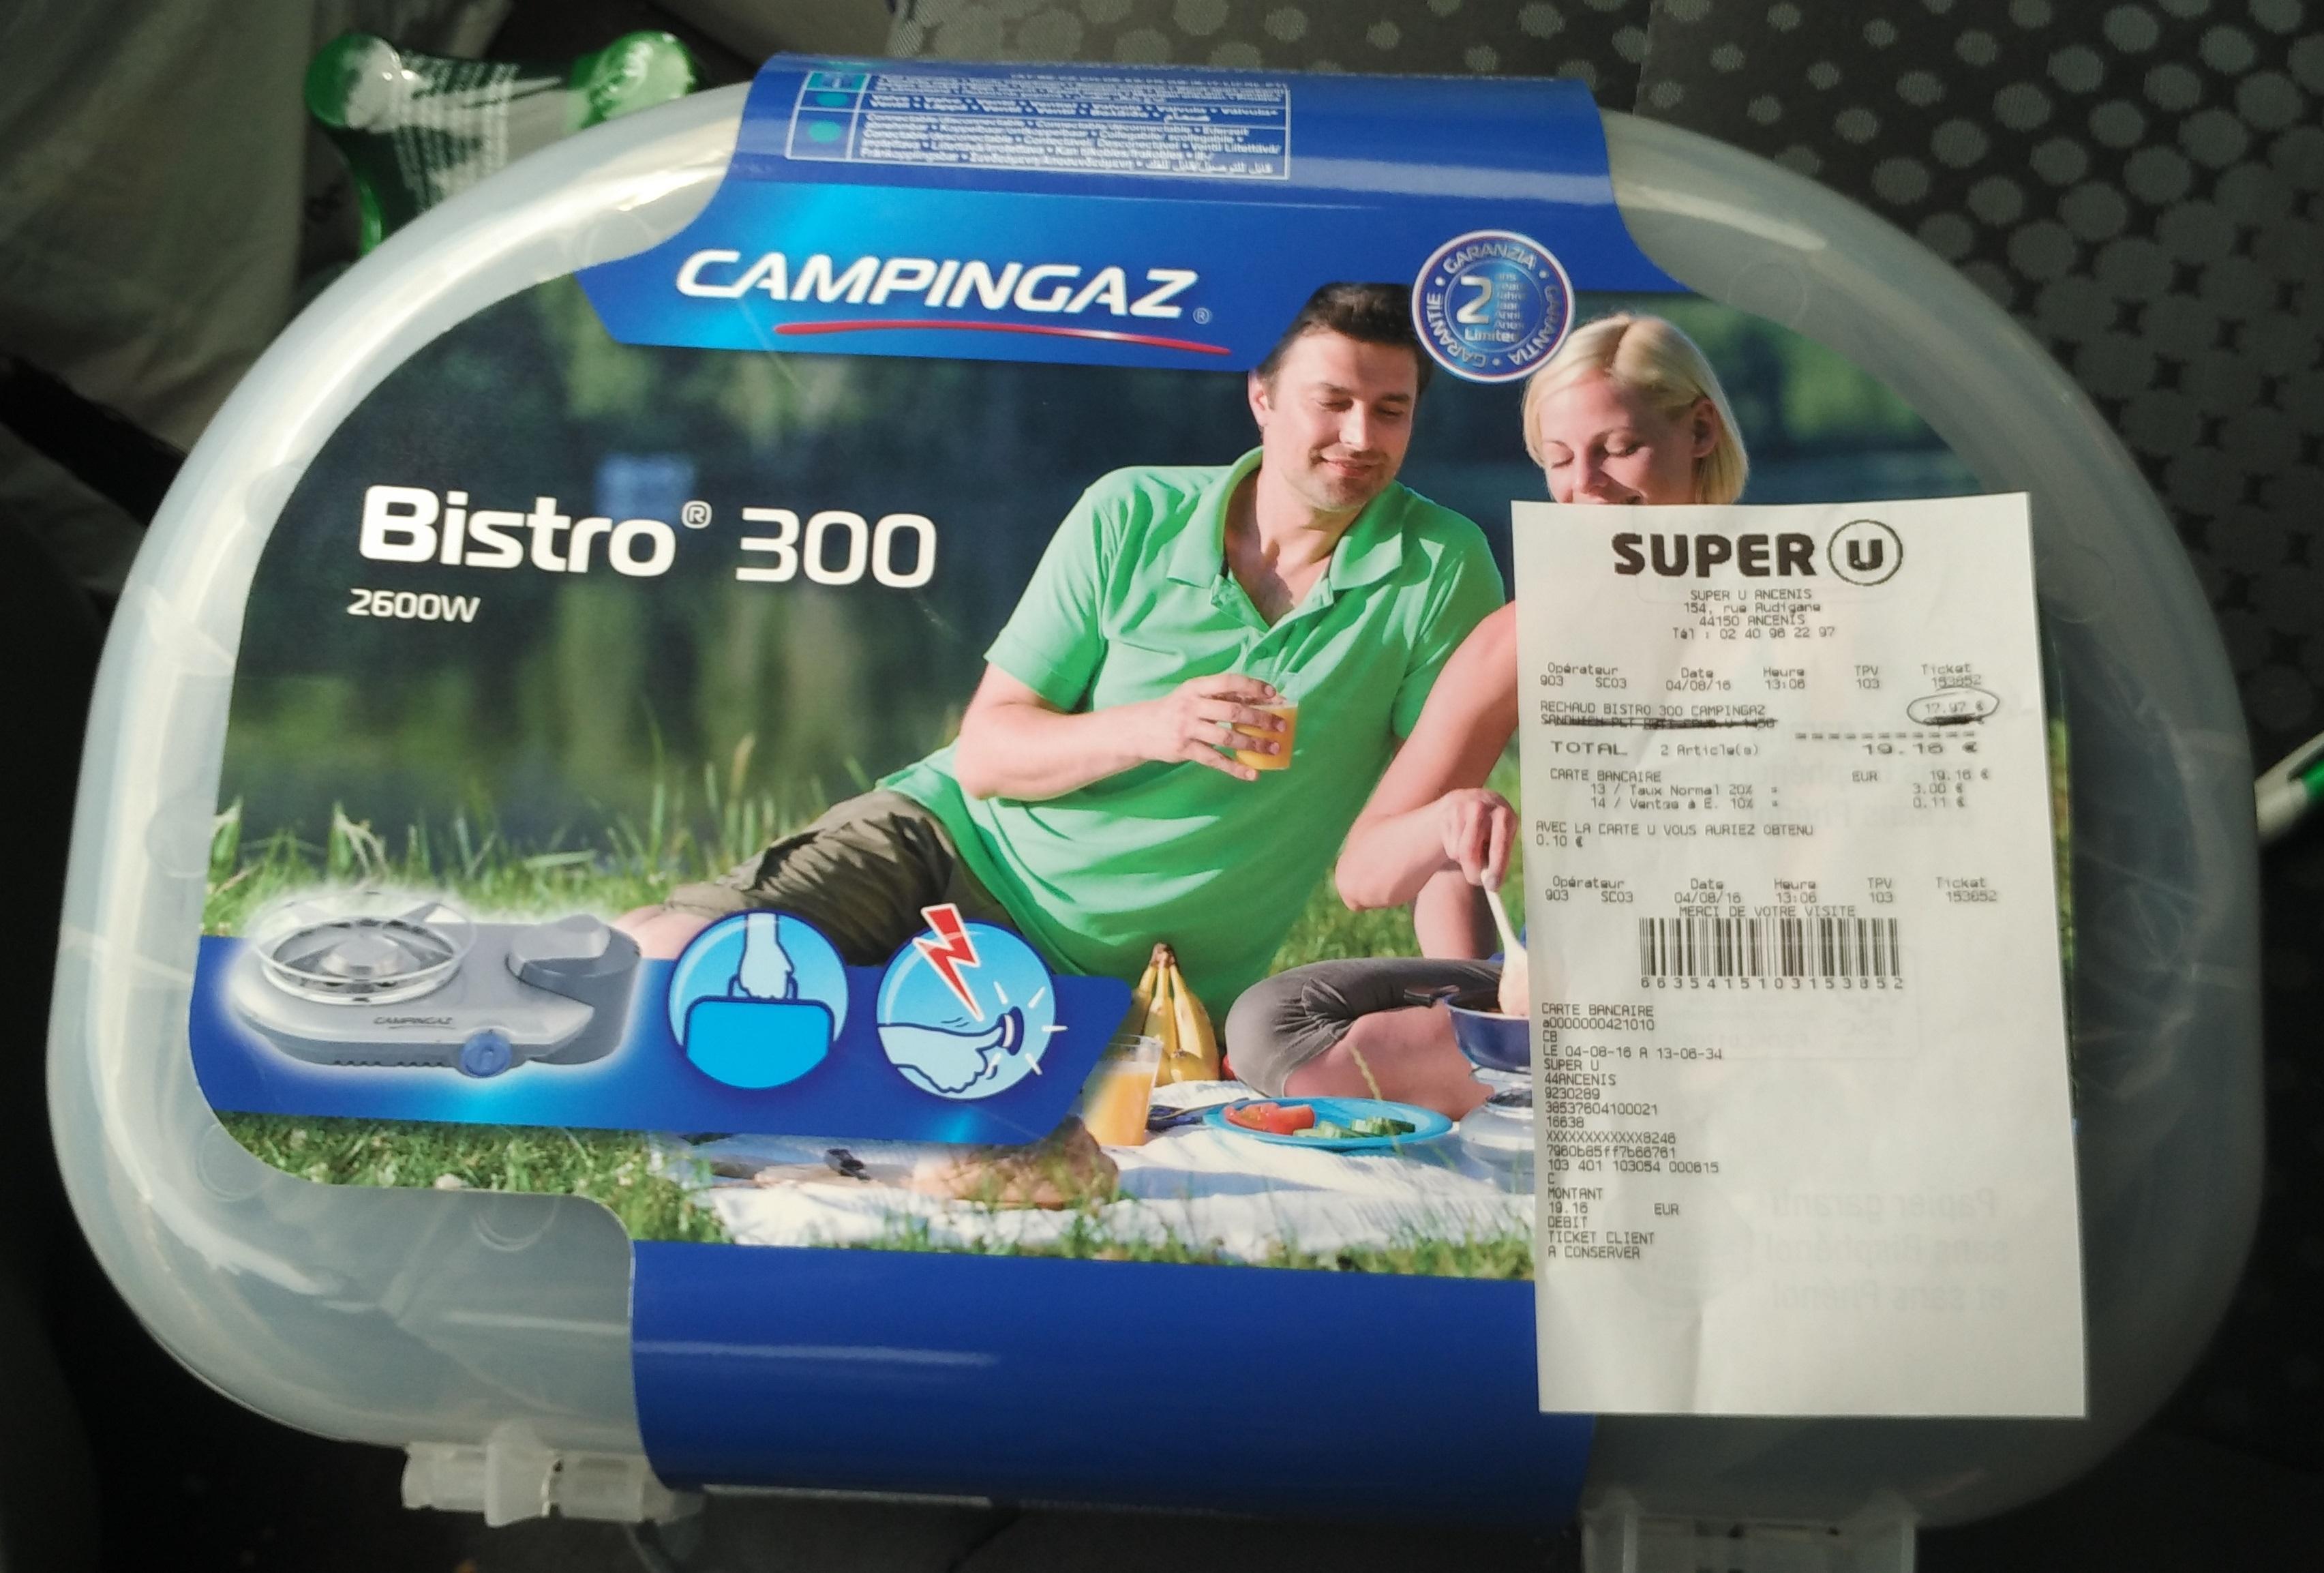 Rechaud Campingaz Bistro 300